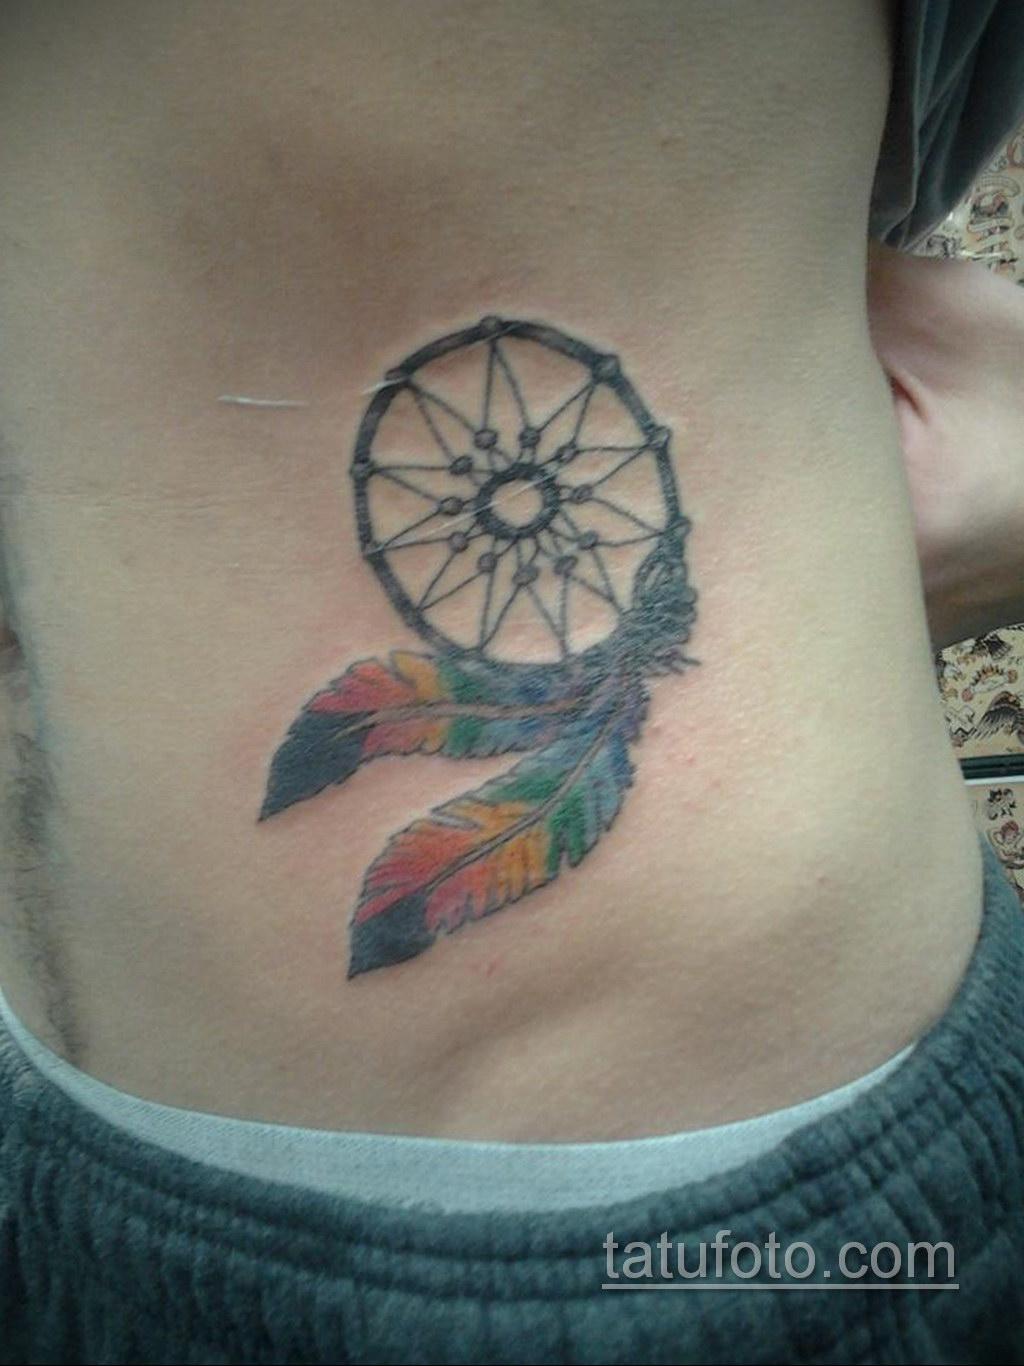 Фото рисунка тату с ловцом снов 22.11.2020 №465 -Dreamcatcher tattoo- tatufoto.com